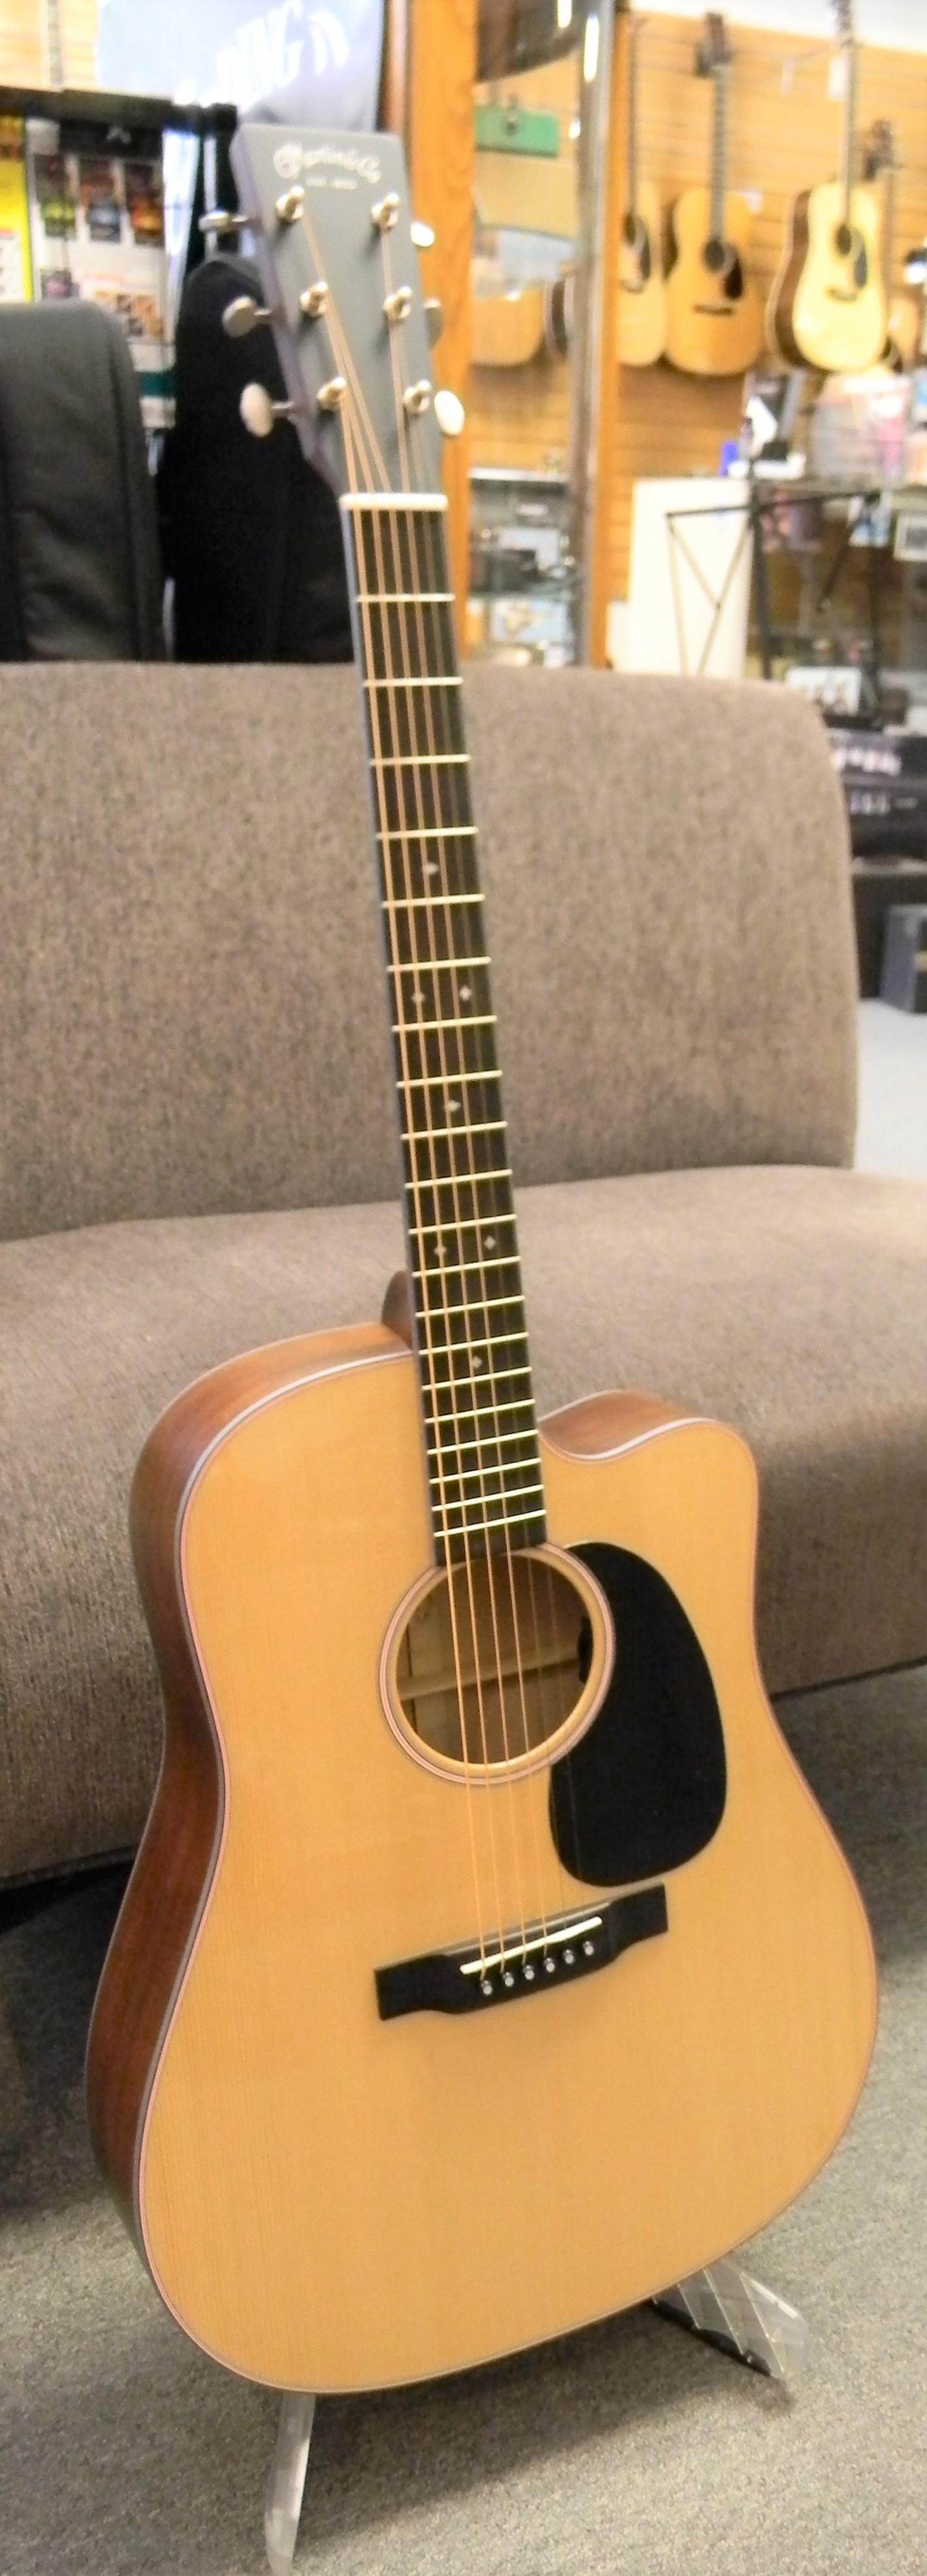 dscn6120 san antonio guitar store guitar tex. Black Bedroom Furniture Sets. Home Design Ideas